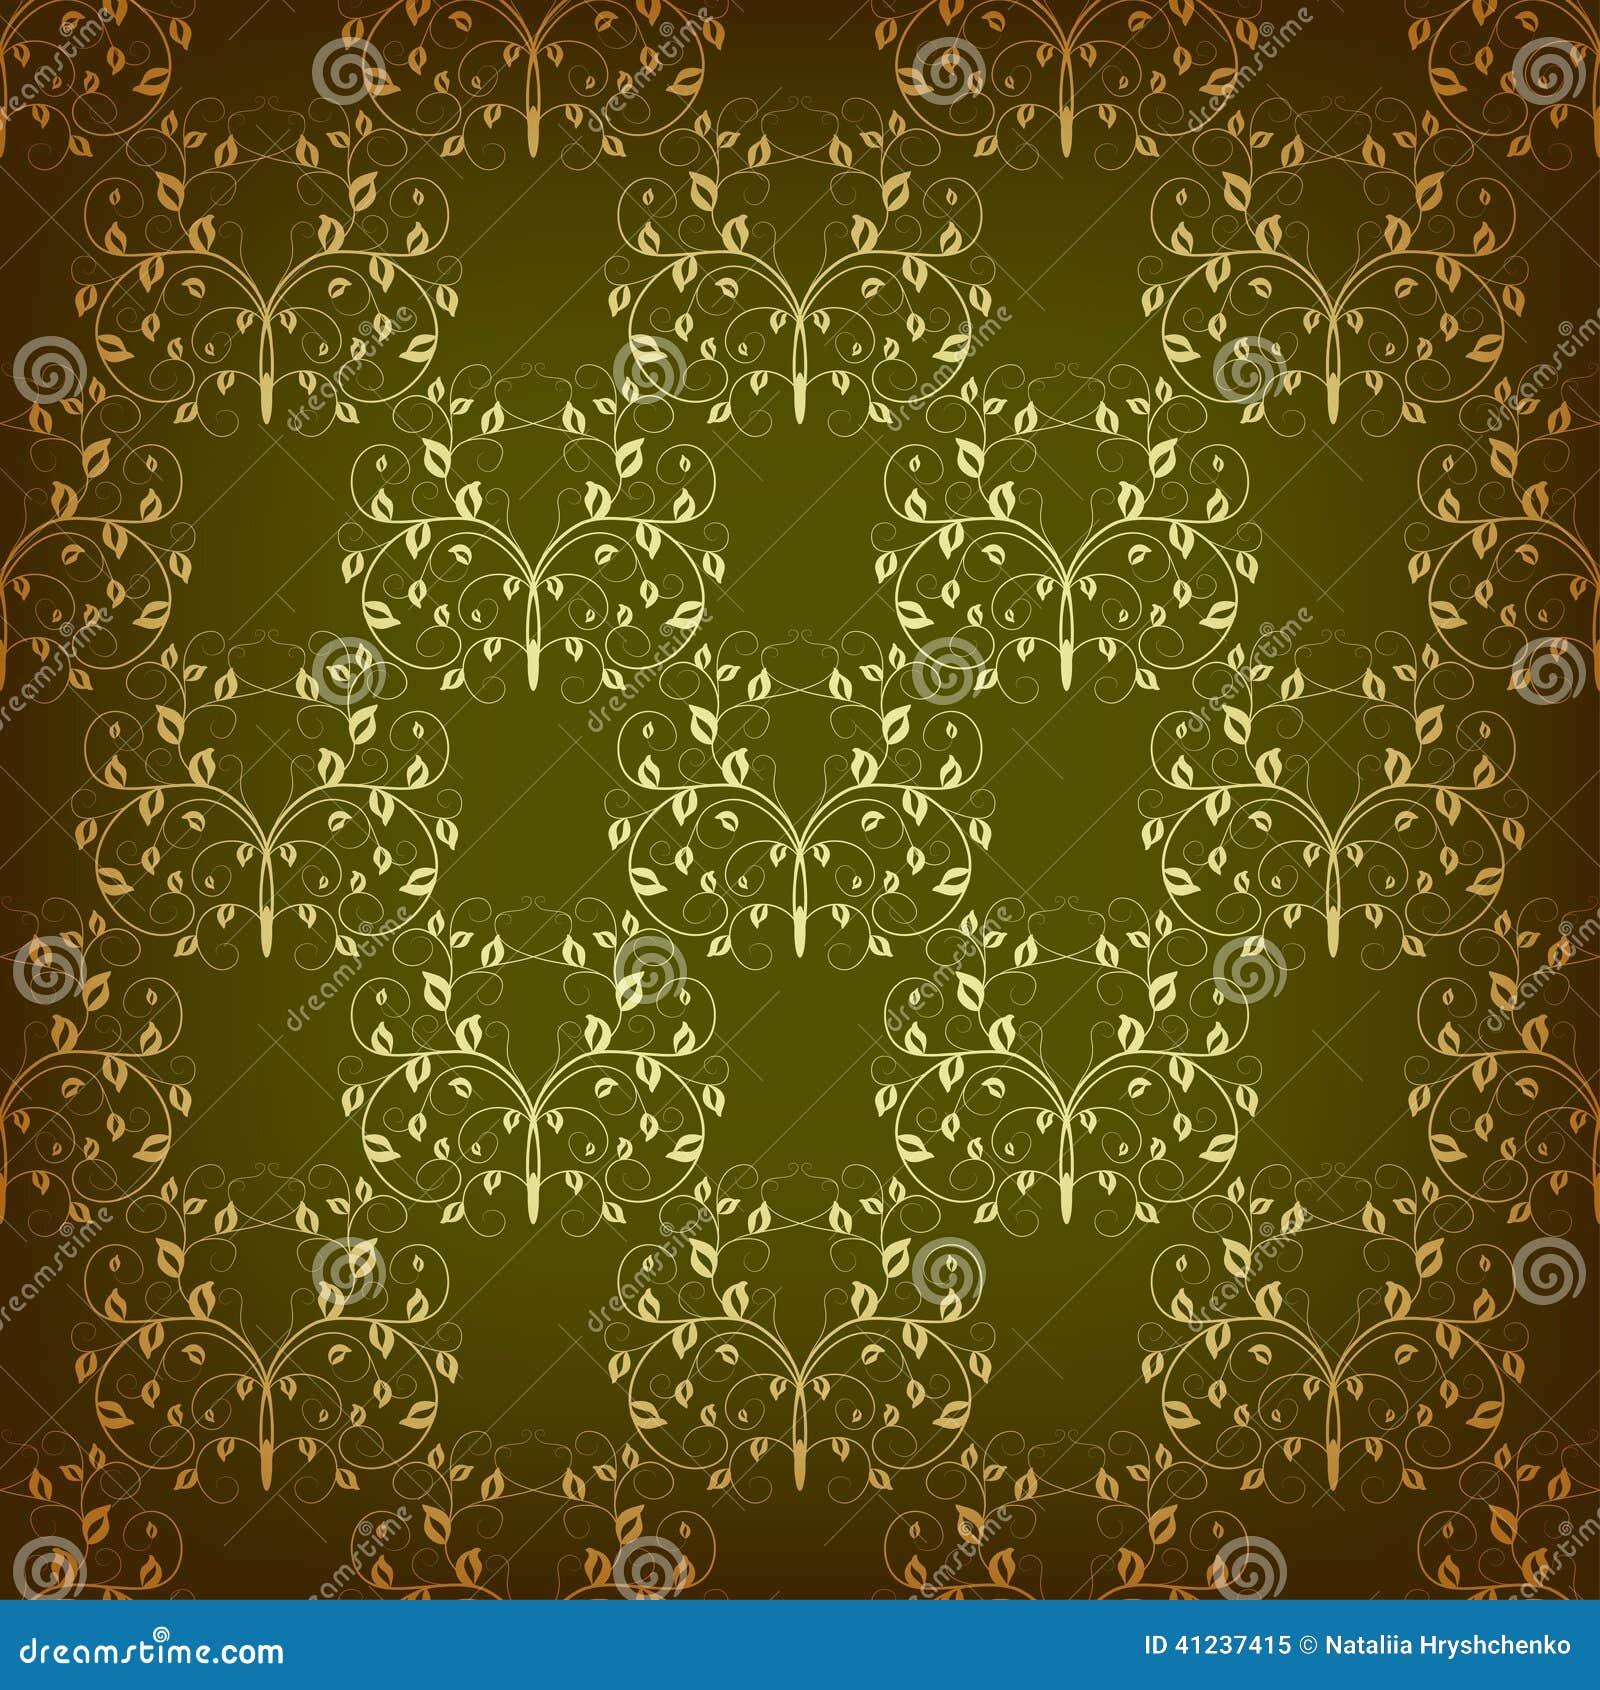 swirling royal pattern wallpaper - photo #15